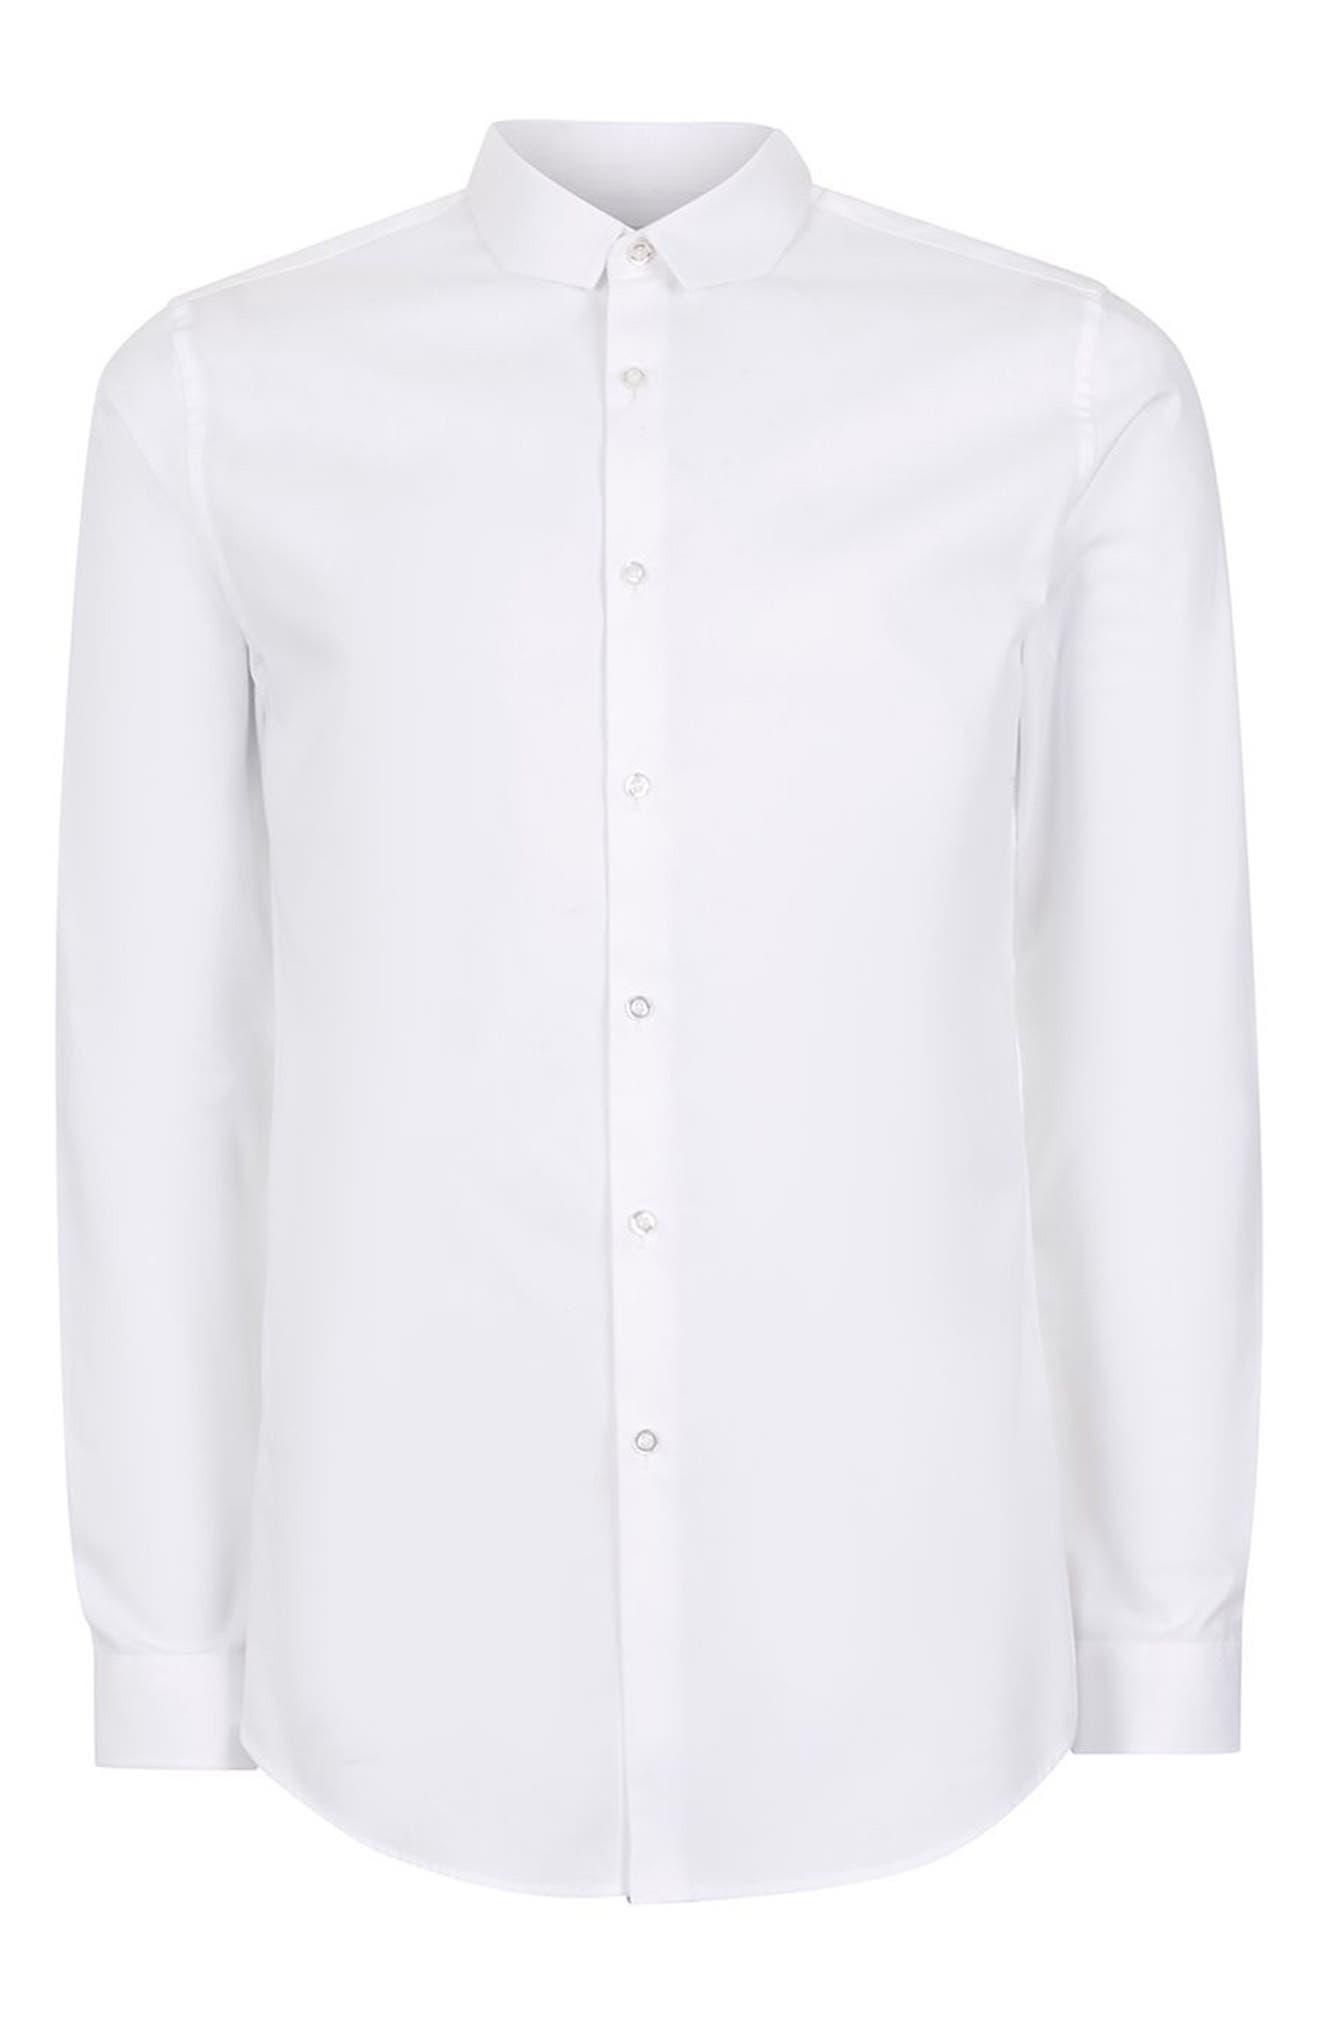 Trim Fit Chisel Collar Dress Shirt,                             Alternate thumbnail 6, color,                             White